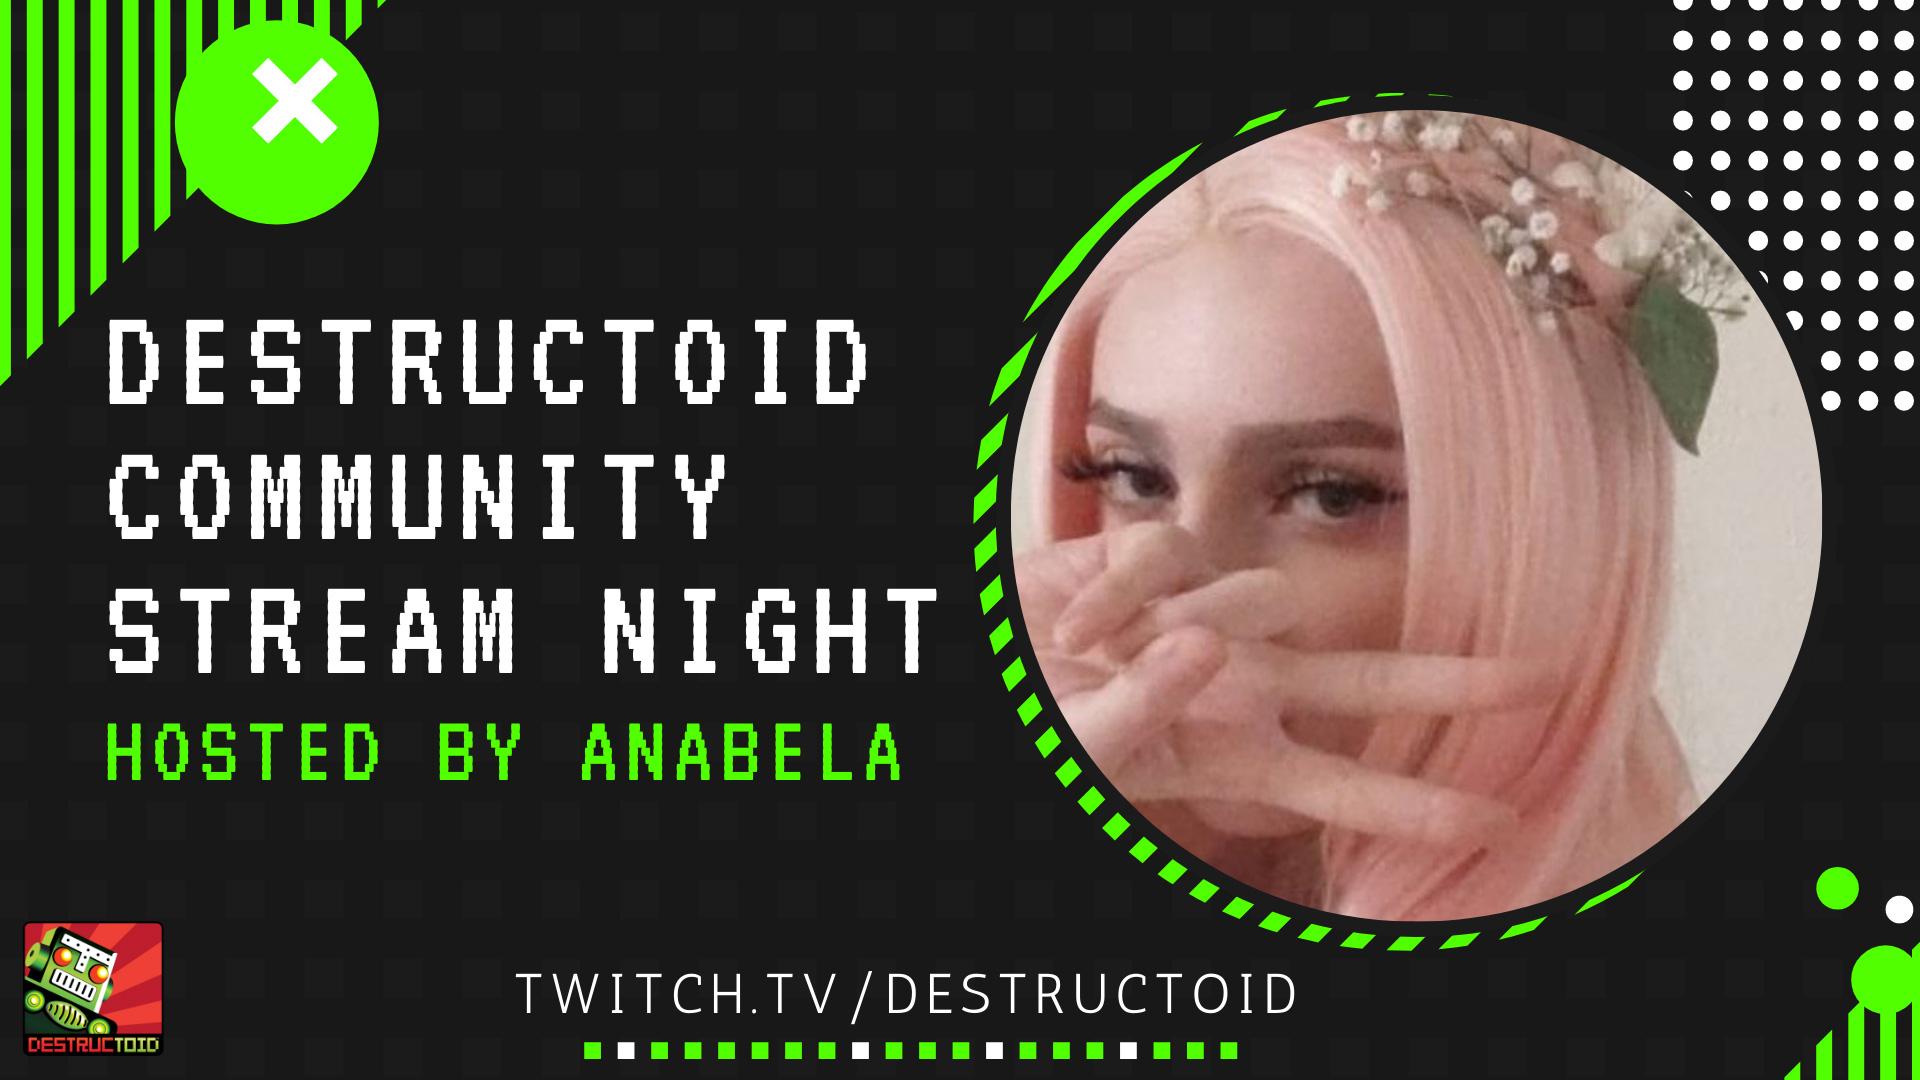 Destructoid community stream night is live on Twitch screenshot